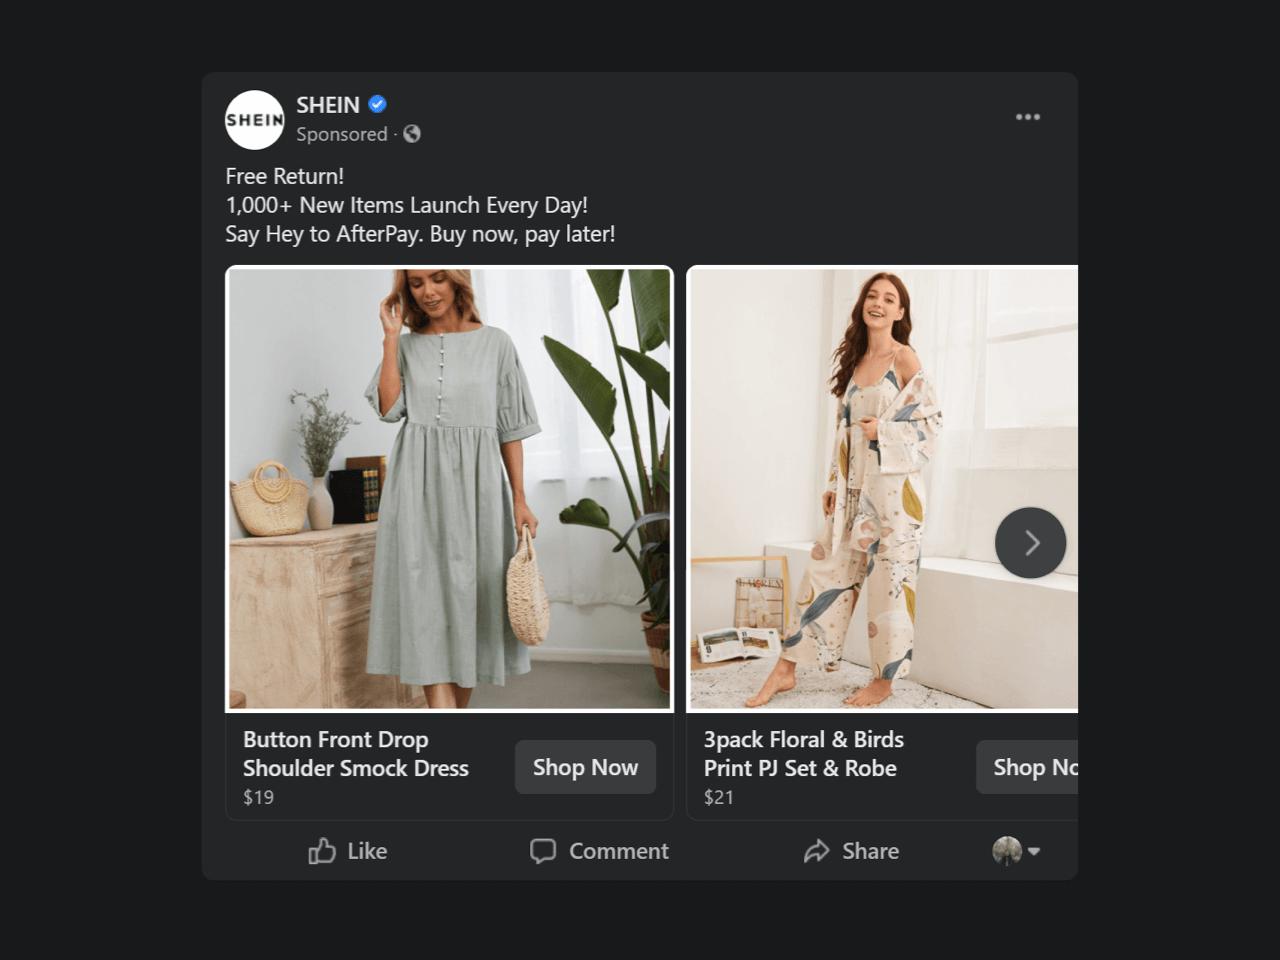 Pixel-based retargeting allows personalizing social media ads